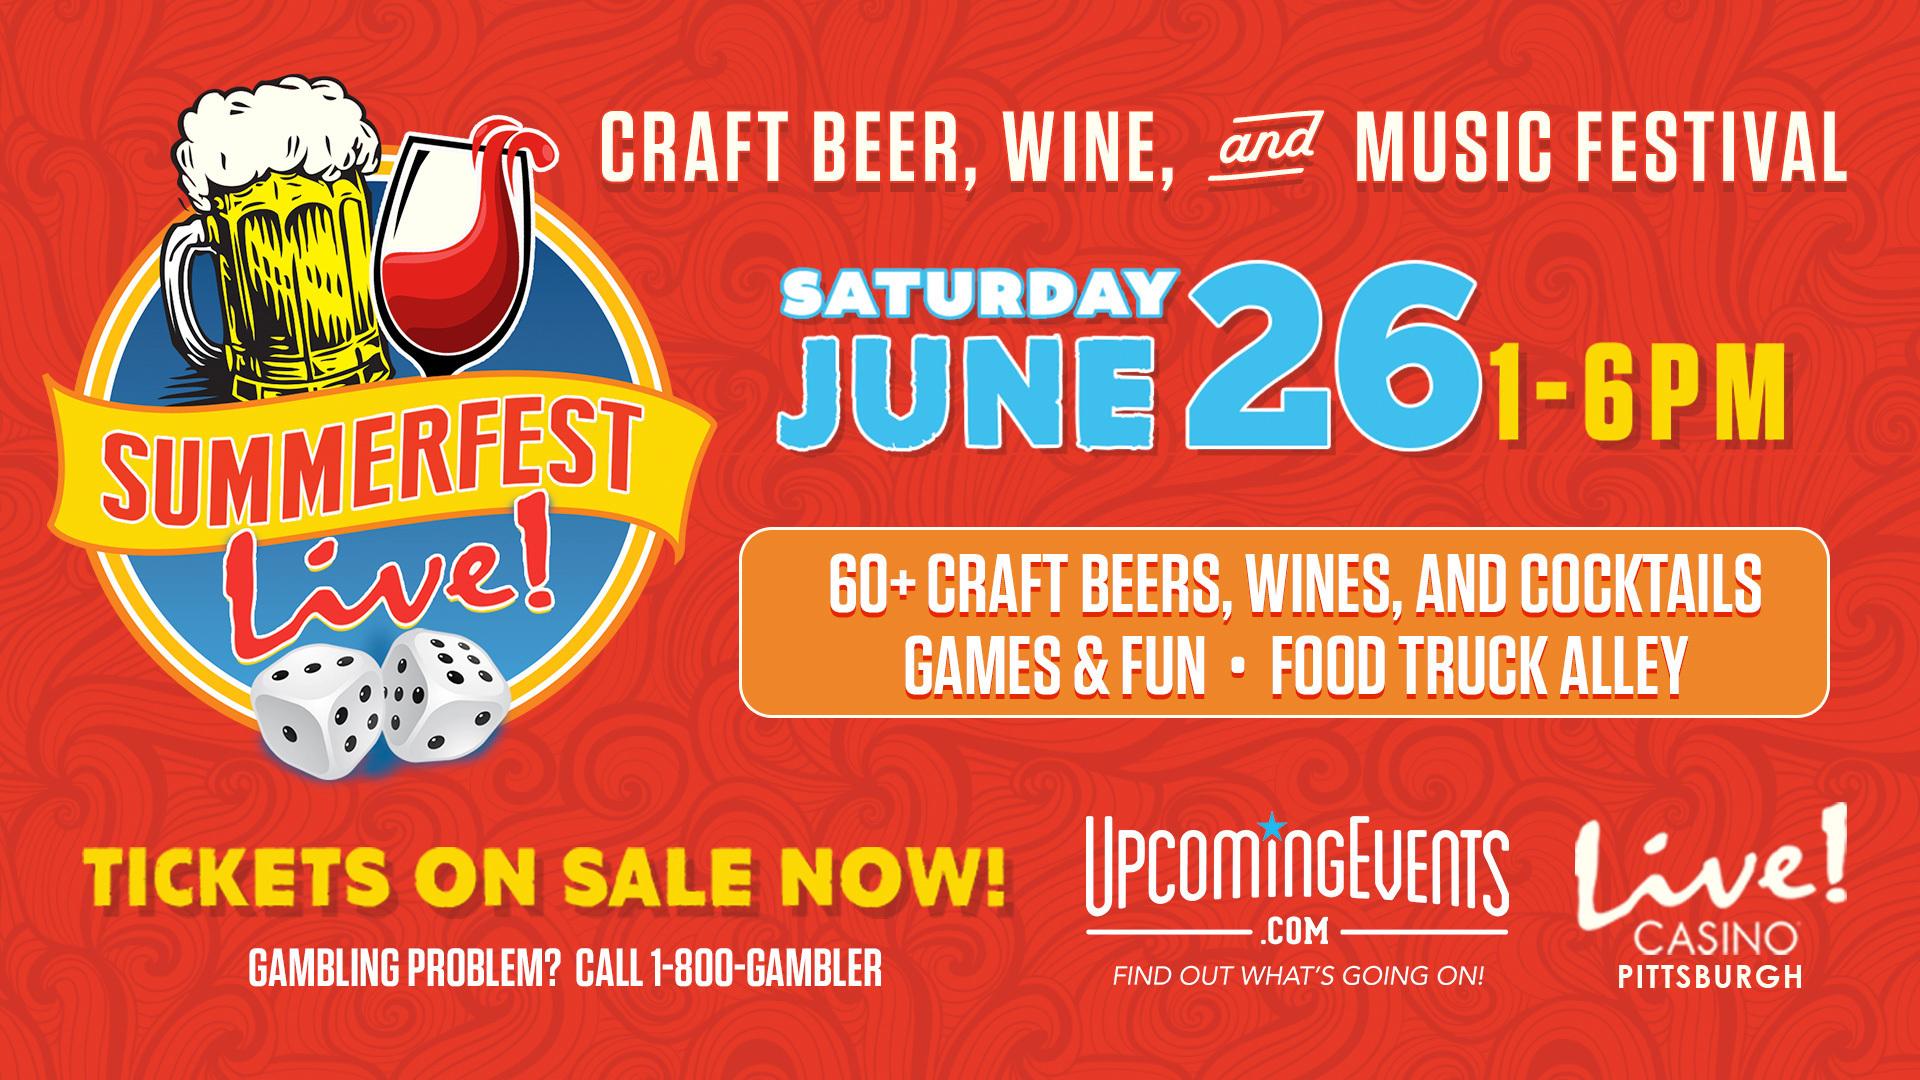 SummerFest Live! Craft Beer & Wine Festival